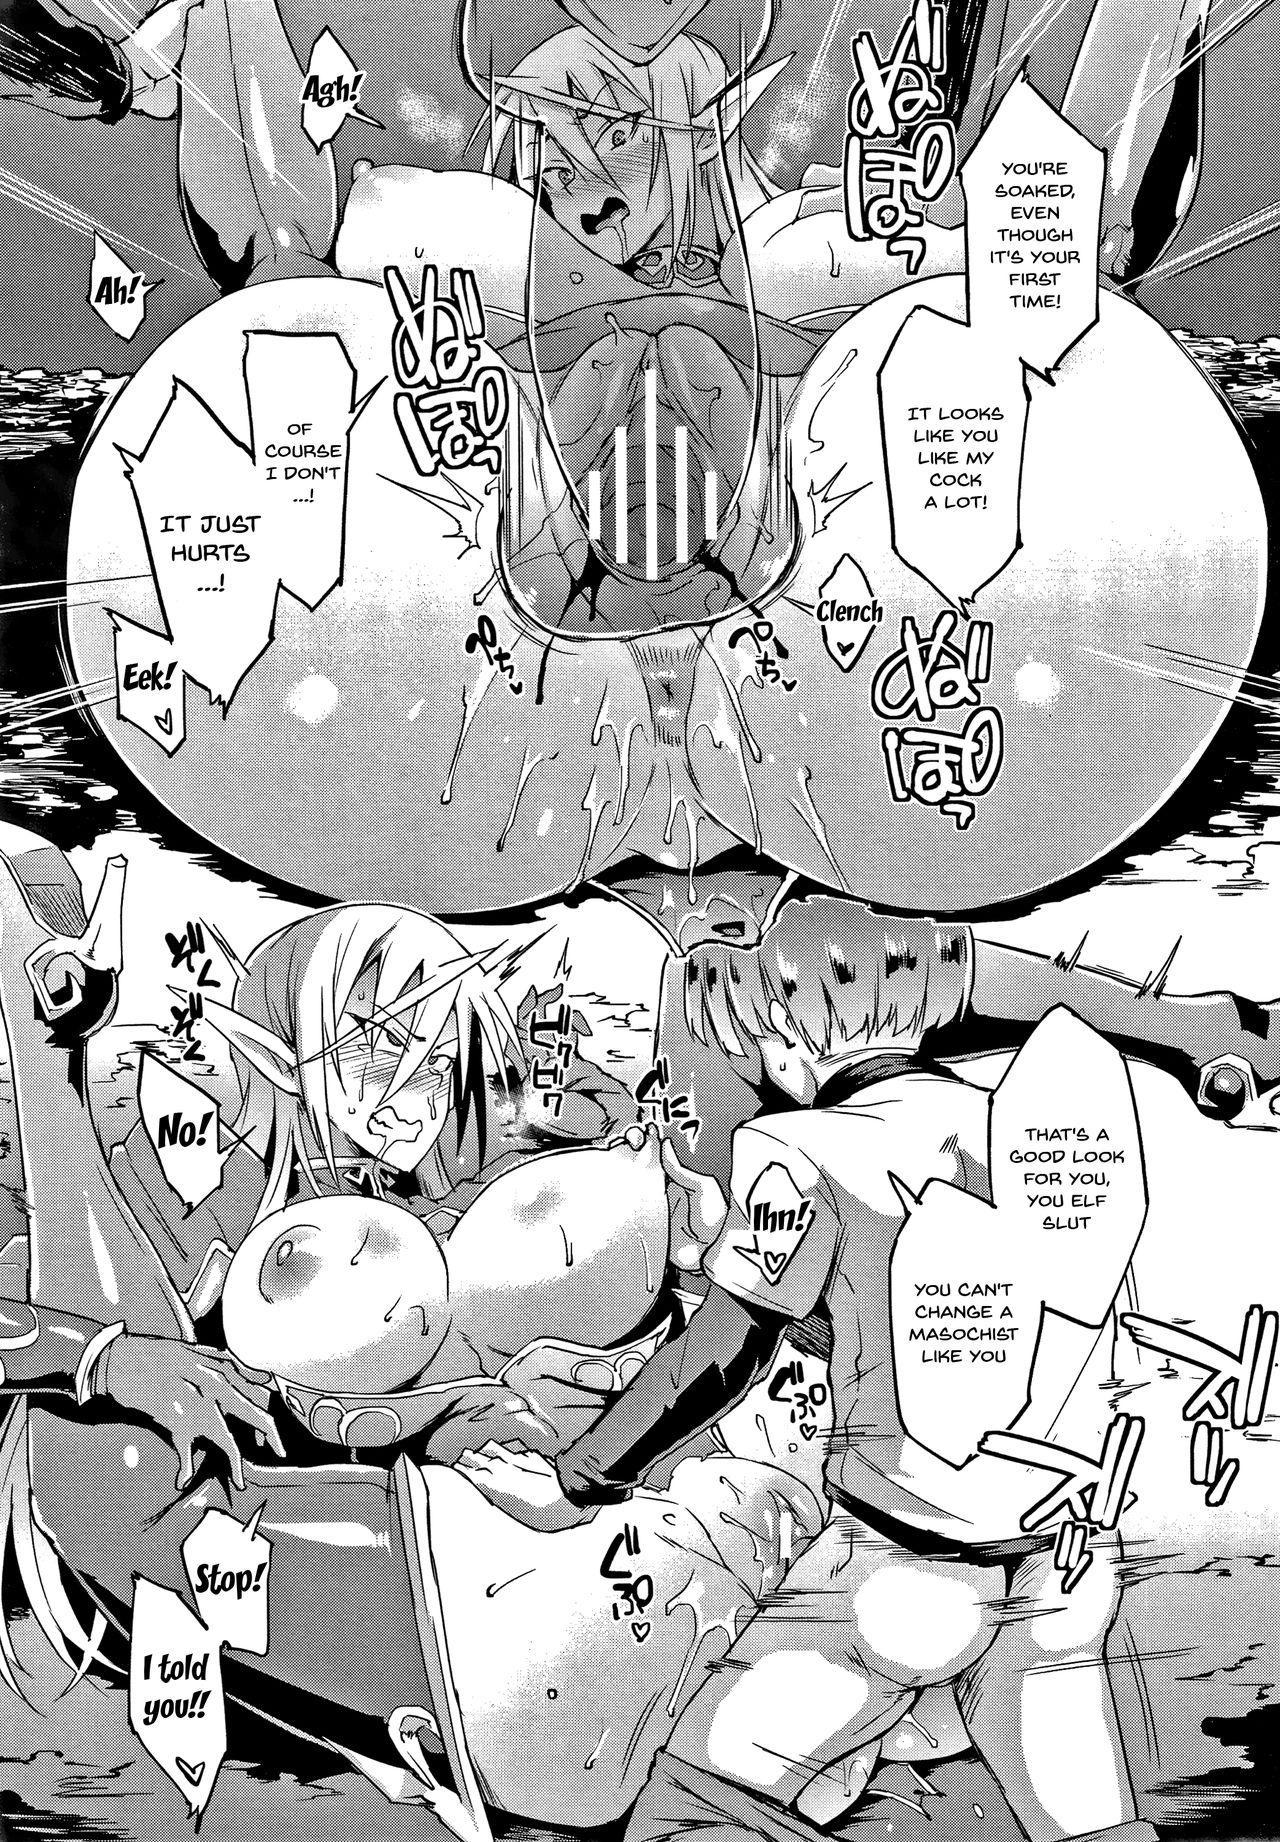 [Fan no Hitori] Sennen Reijou ~ My Lady, My Master ~  Ch.1-3 [English] {Doujins.com} 15